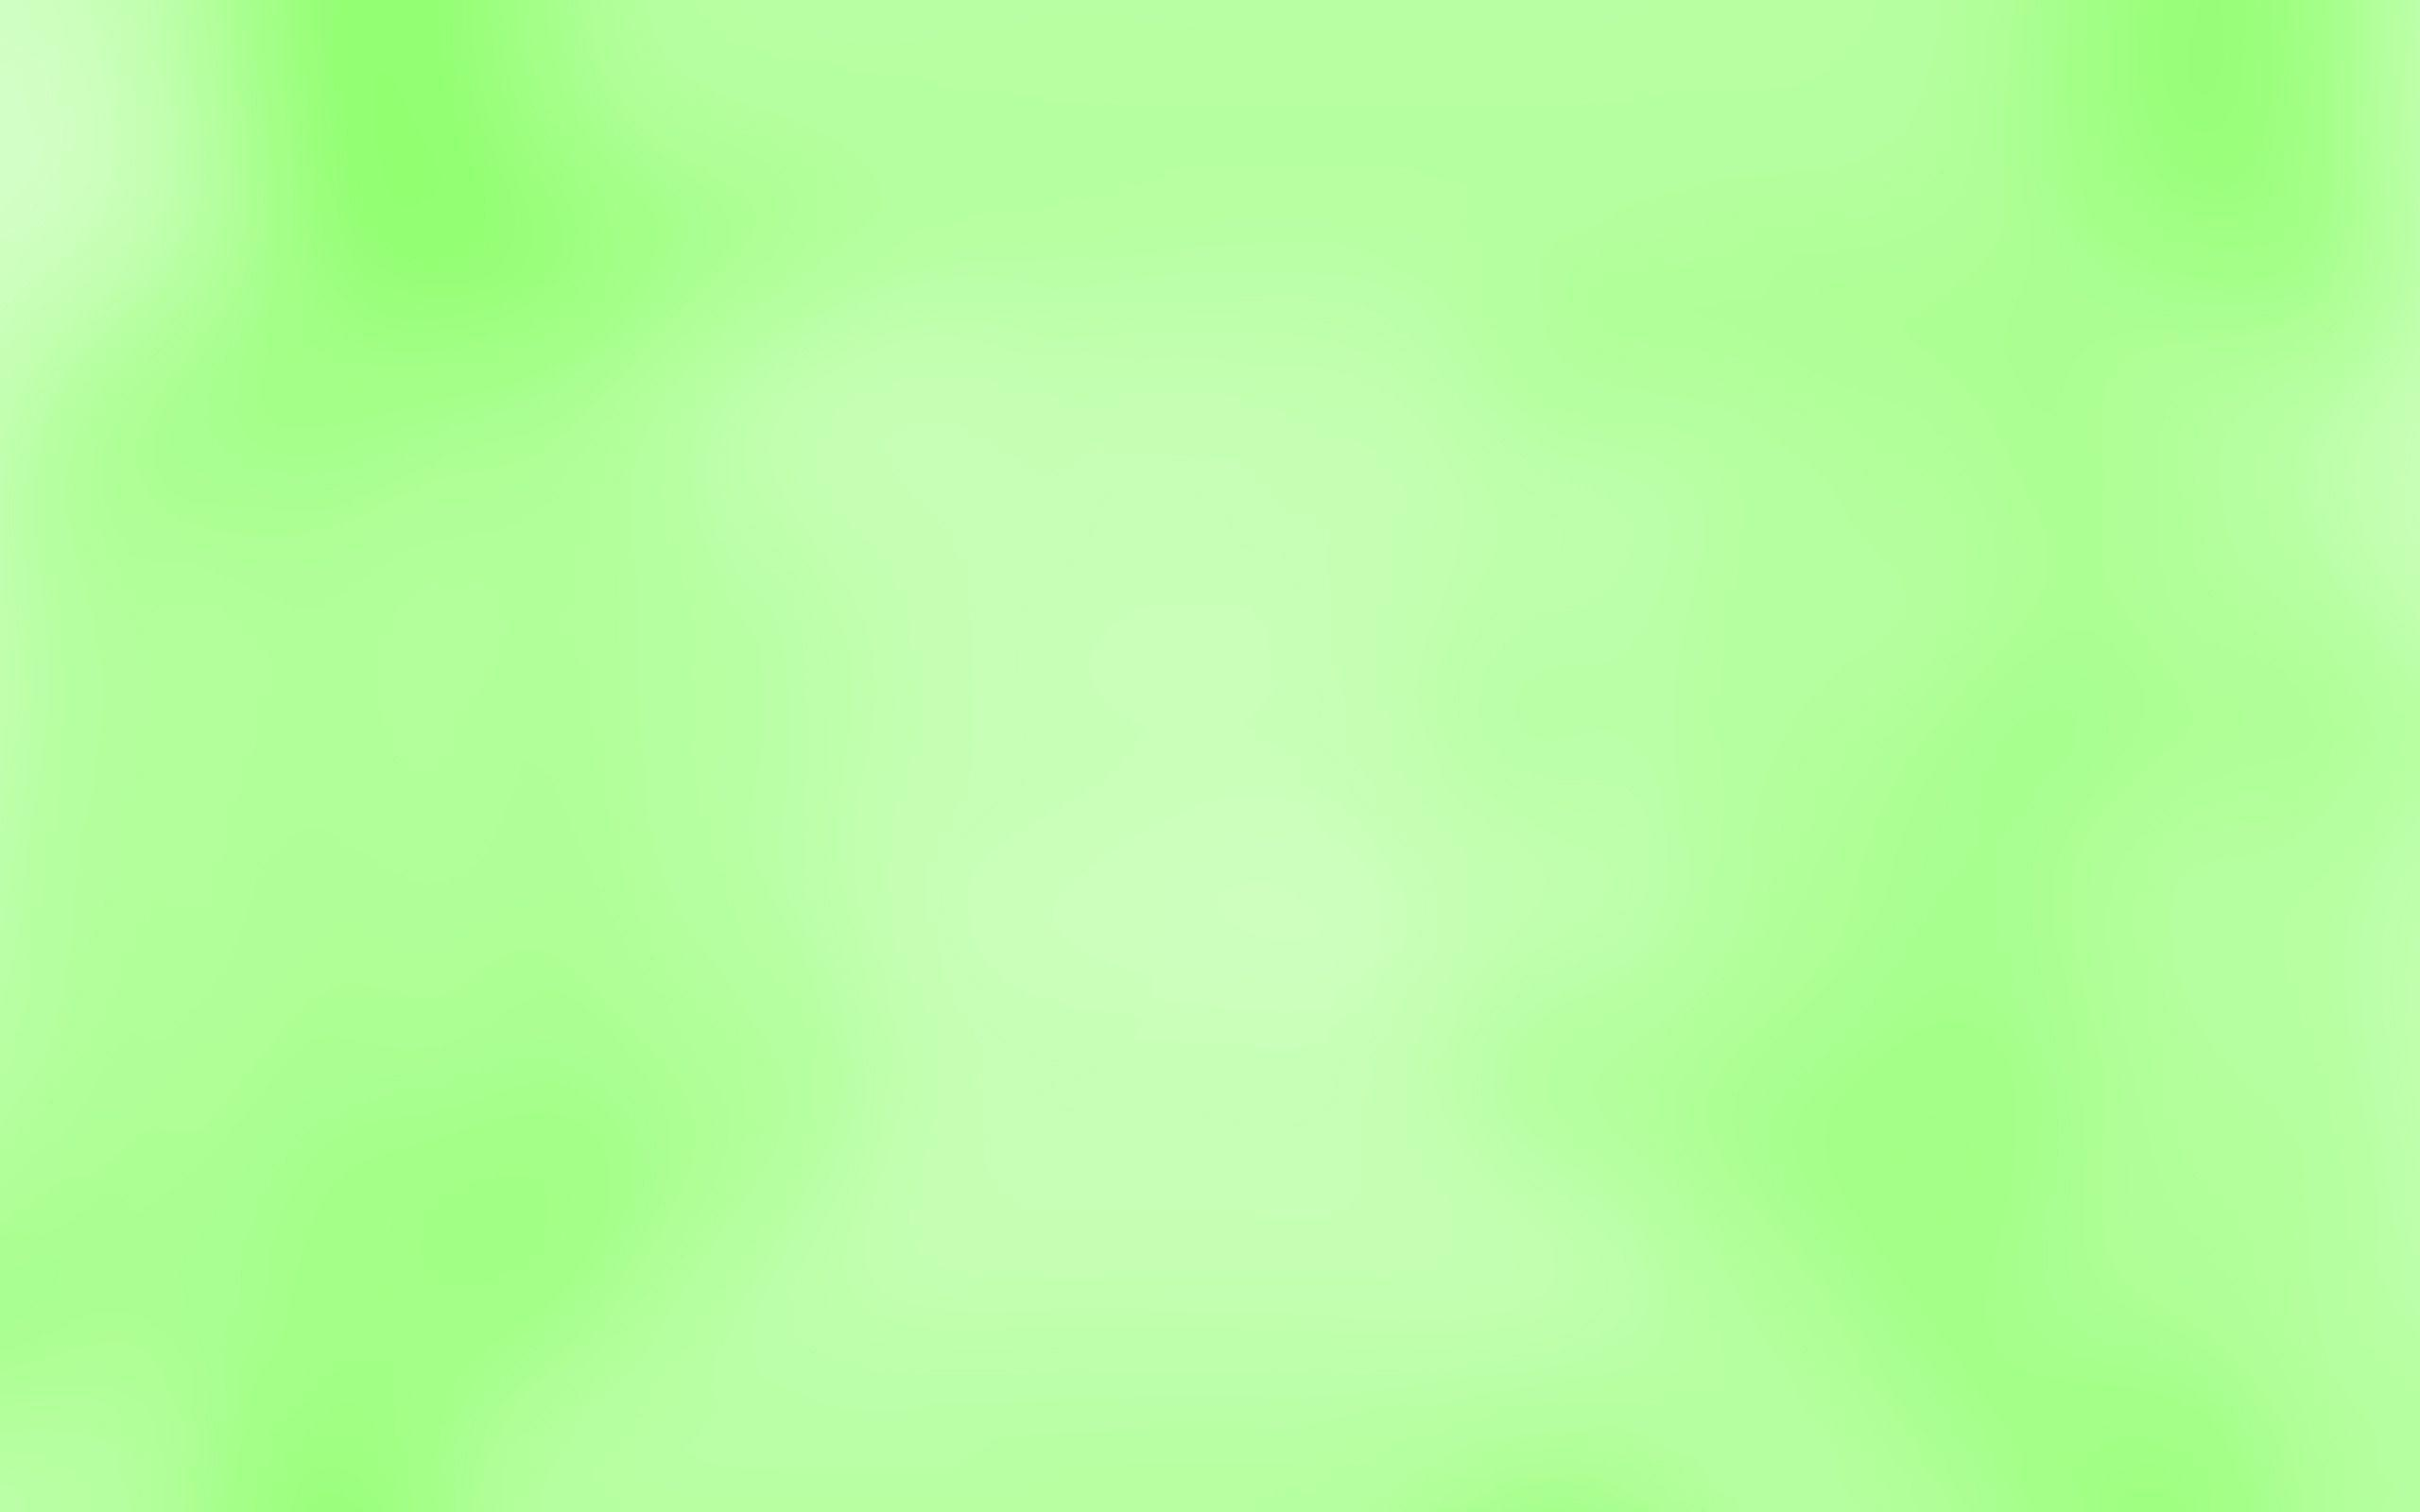 Light Green Gradient Wallpapers Wallpaper Cave